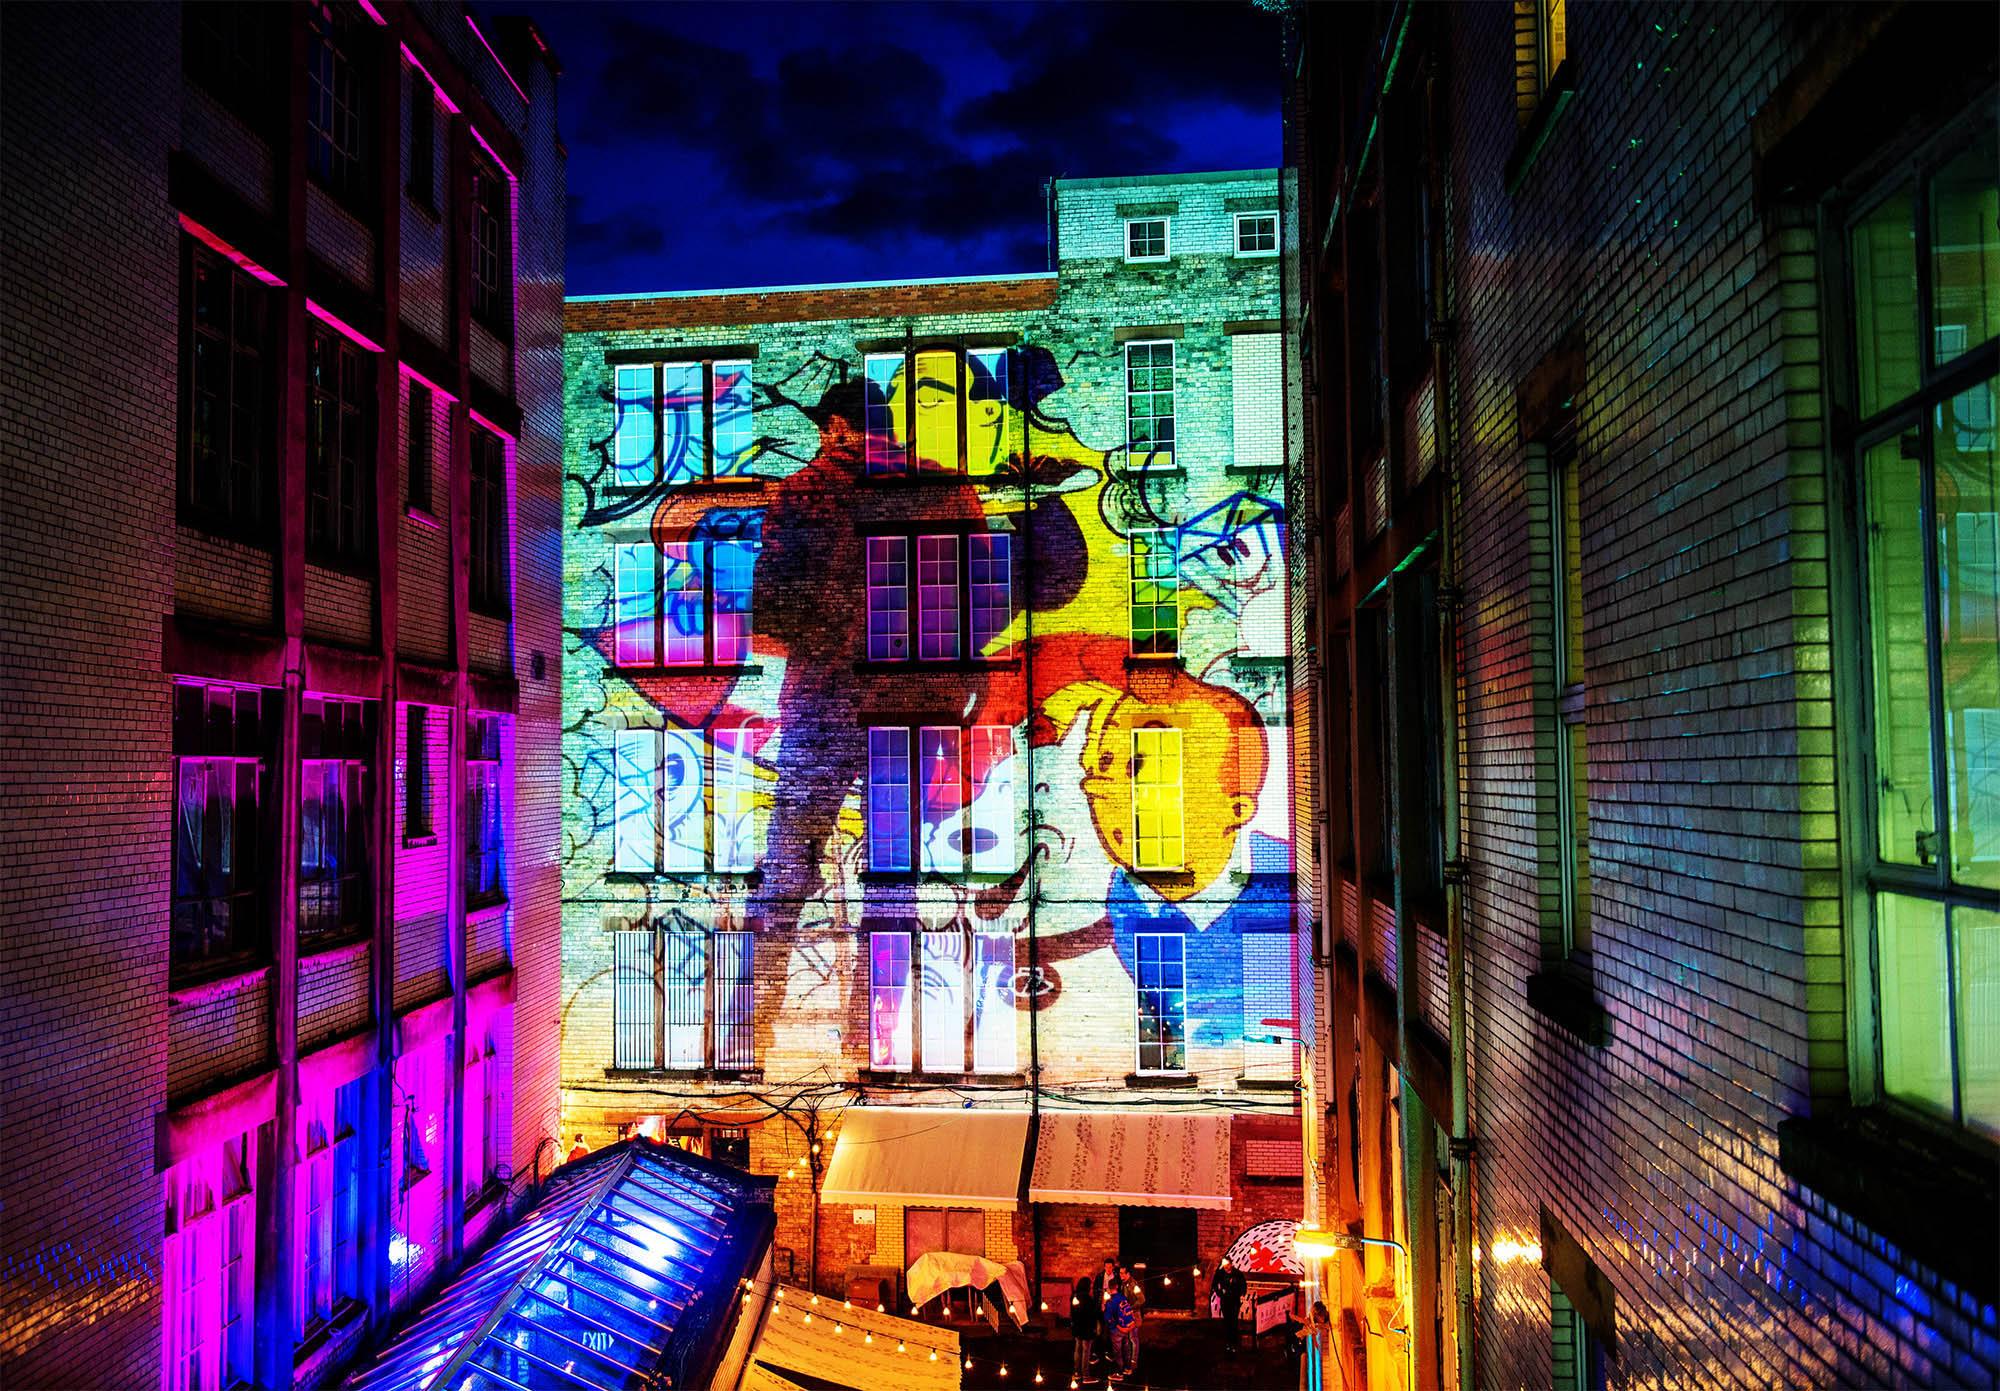 Heverlee Lager Graffiti Projection timelapse, Tontine Lane Glasgow